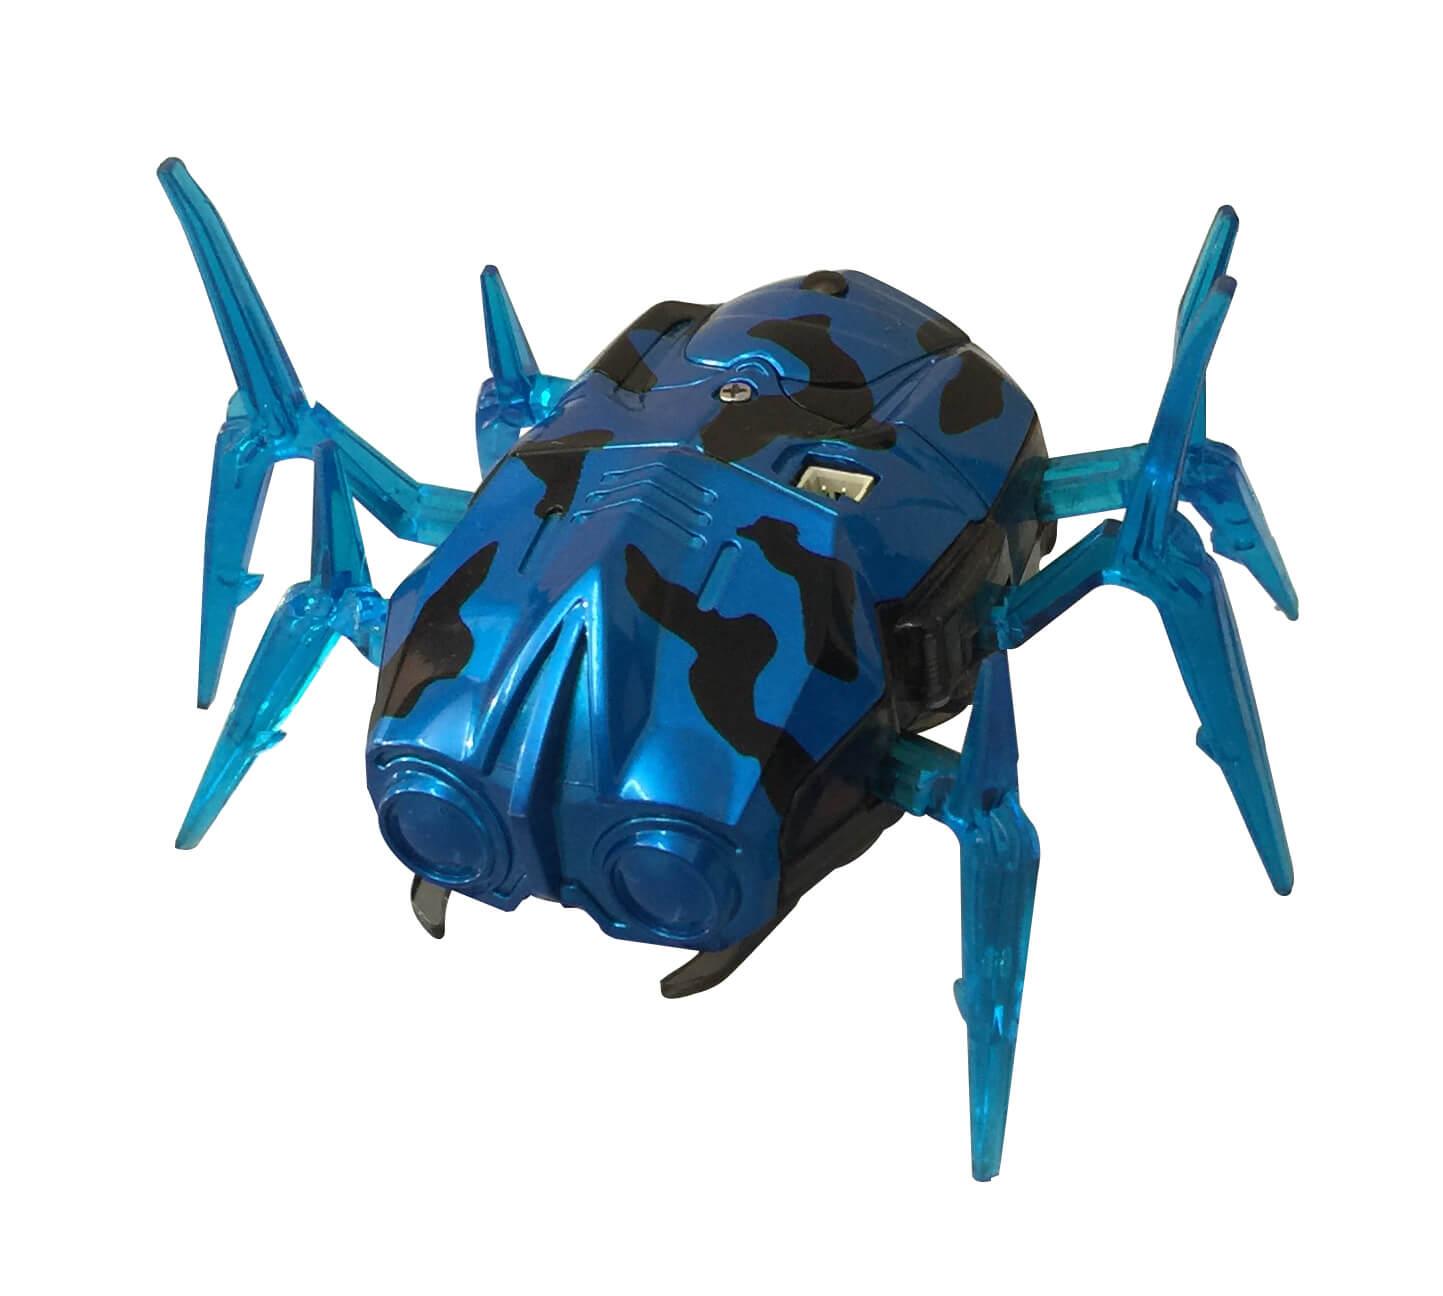 Infrared Bug Game